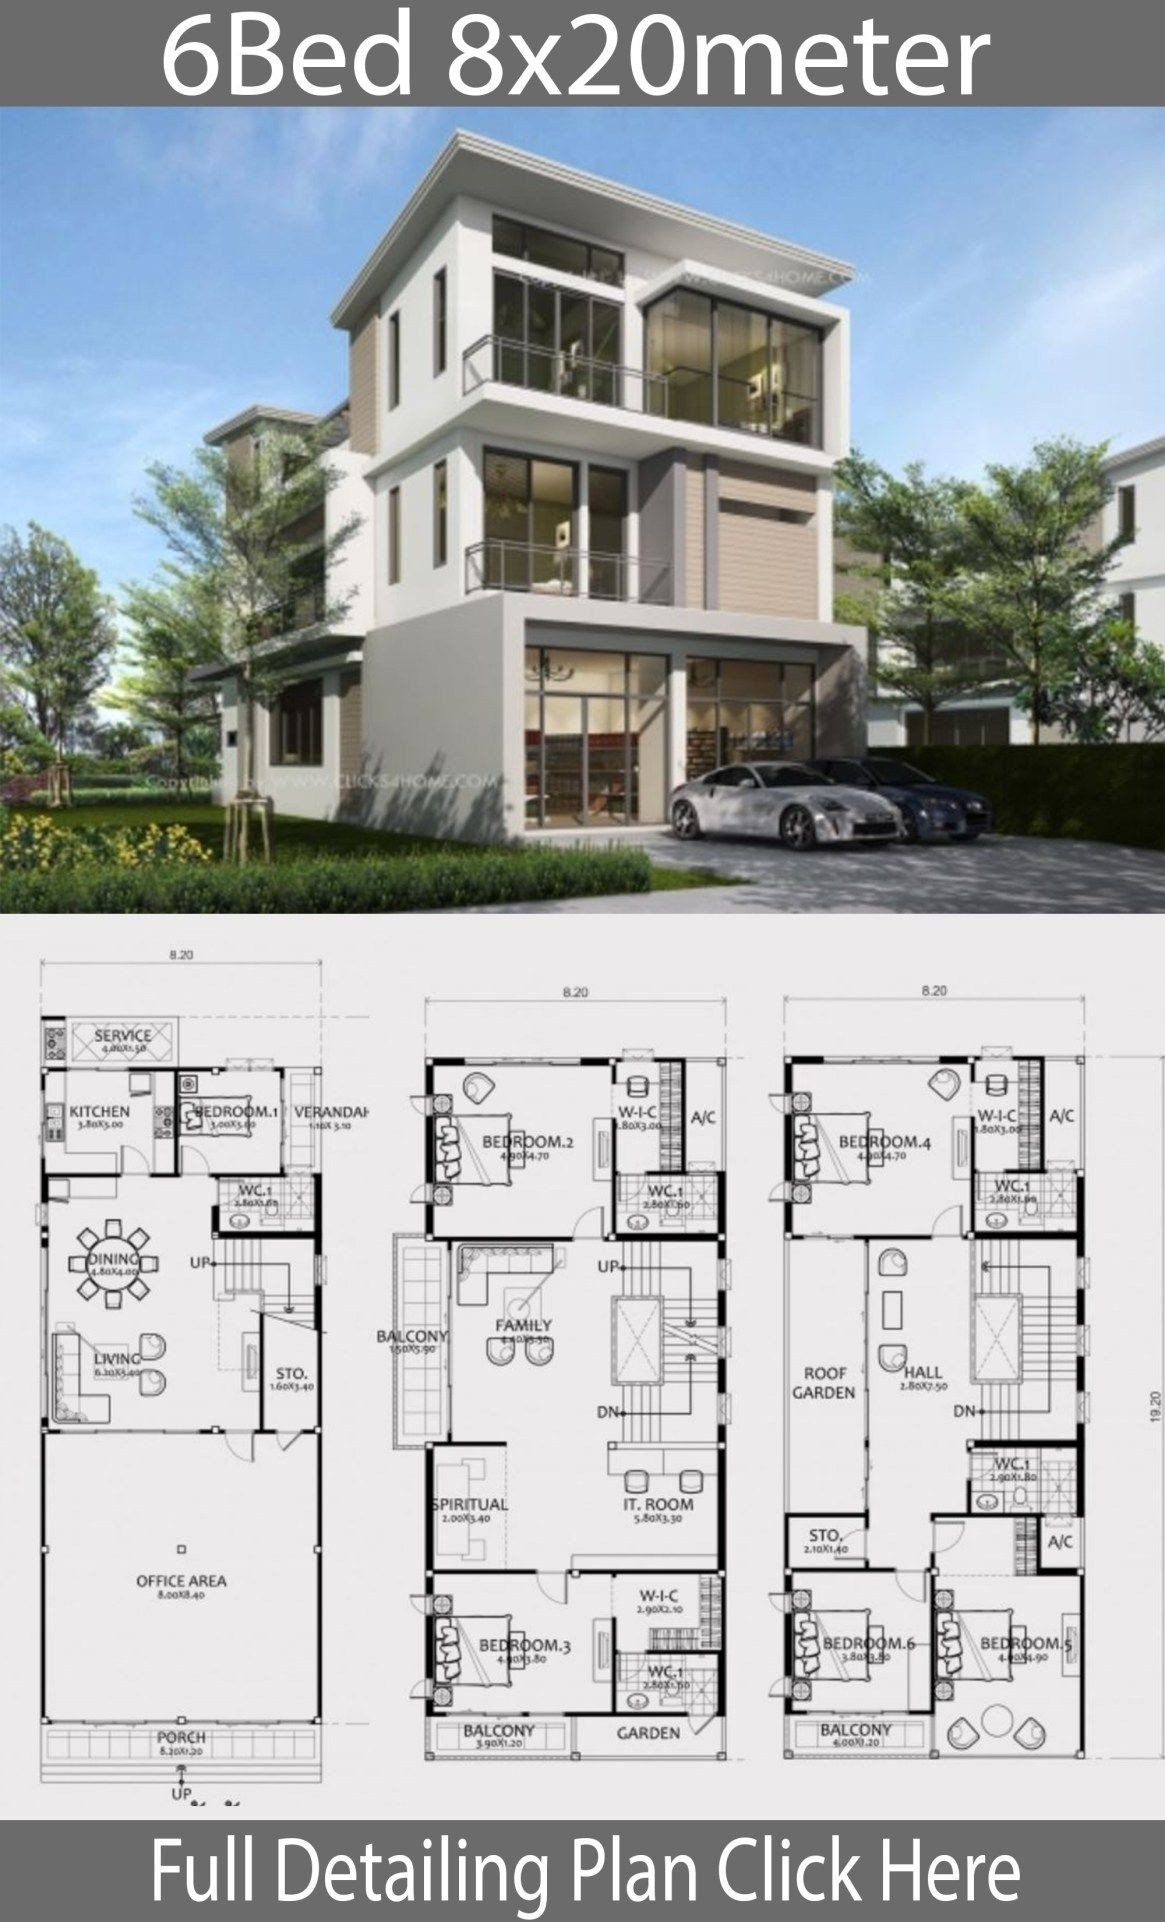 Modern House Plans Three Story Home Design Plan 8x20m With 6 Bedrooms Arsitektur Arsitektur Modern Arsitektur Rumah